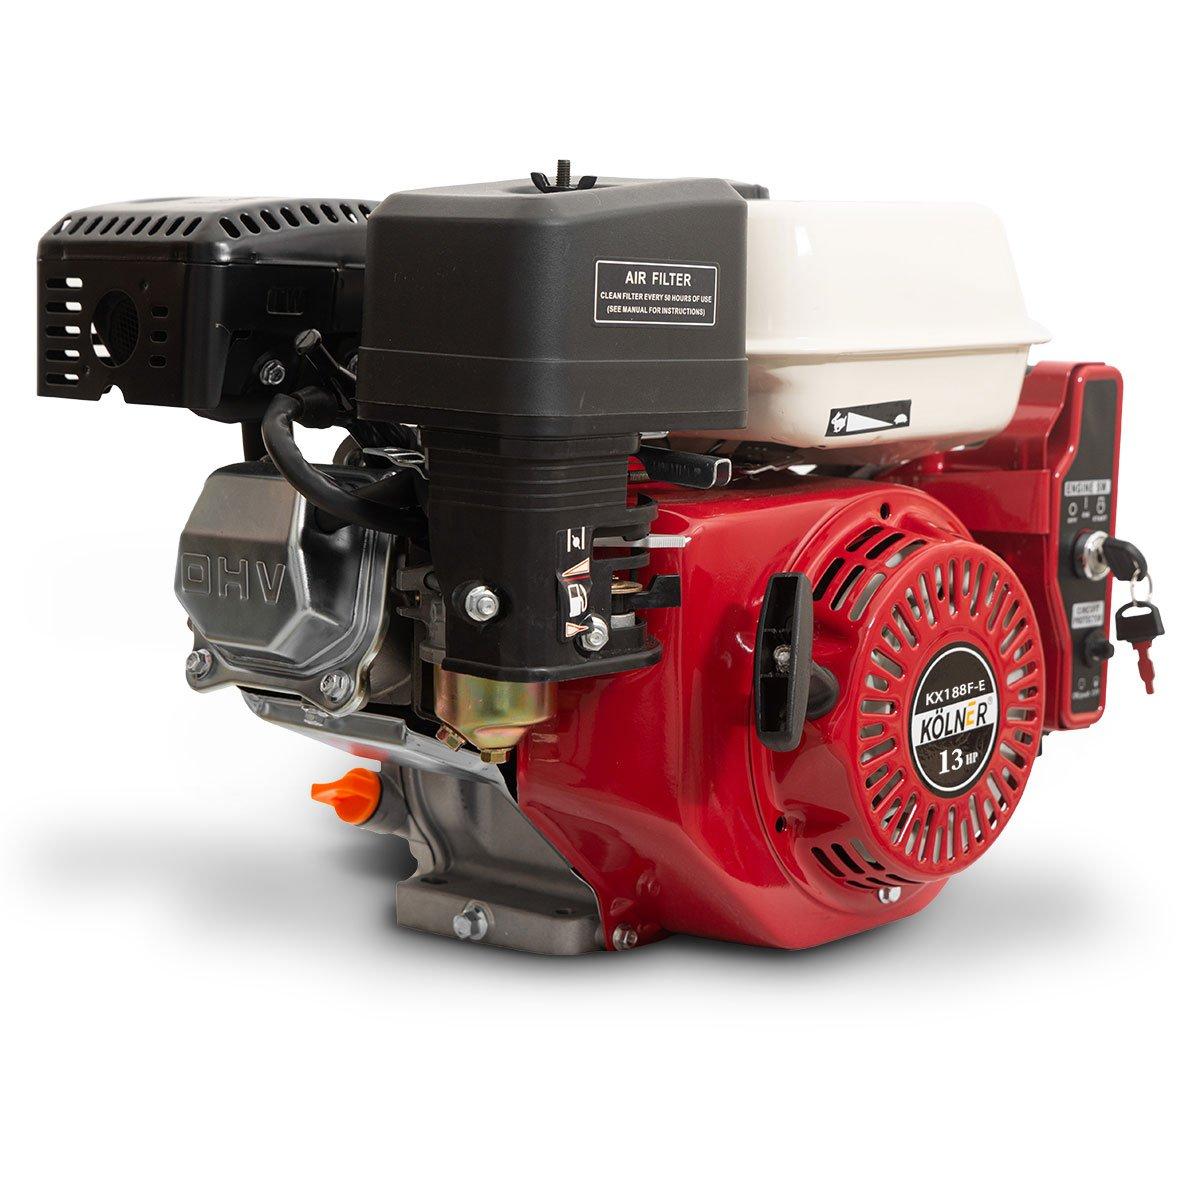 Kolner 13hp 25.4mm Horizontal Key Shaft Q Type Petrol Engine Electric Start